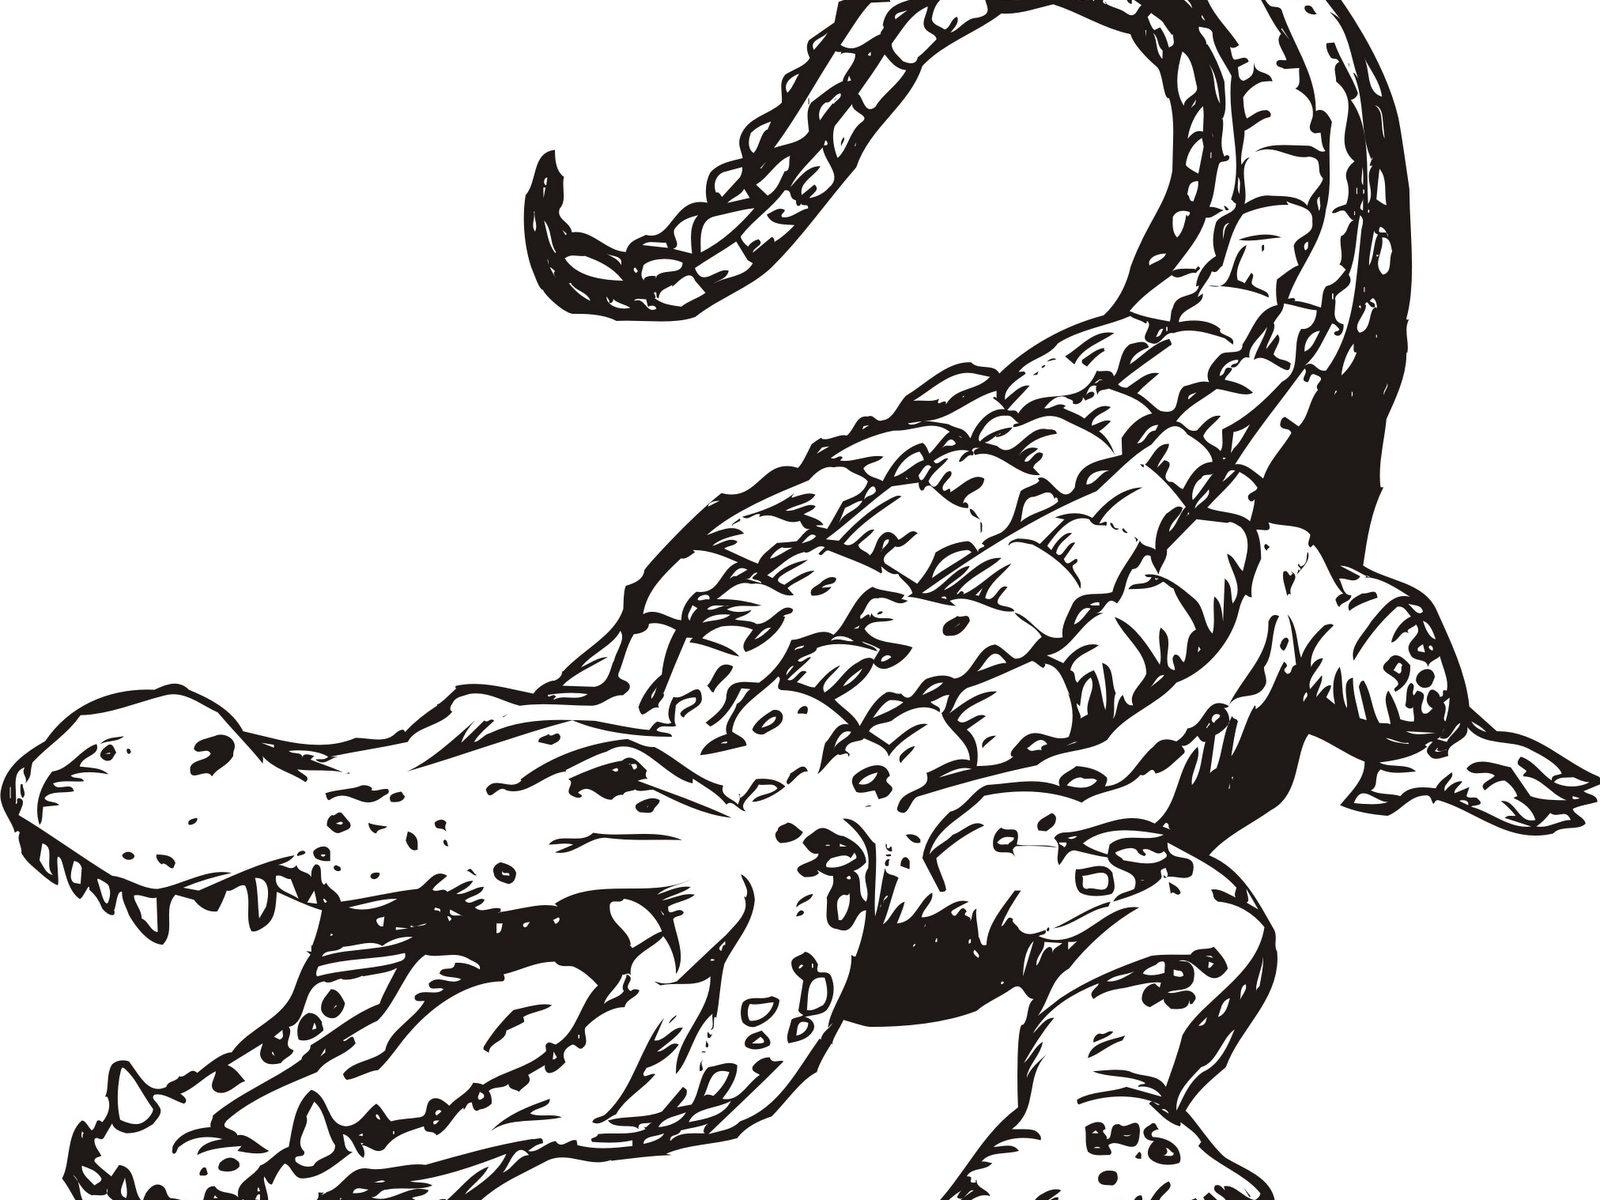 subaru vector at getdrawings free for personal use subaru 1993 22B STi nile crocodile coloring page